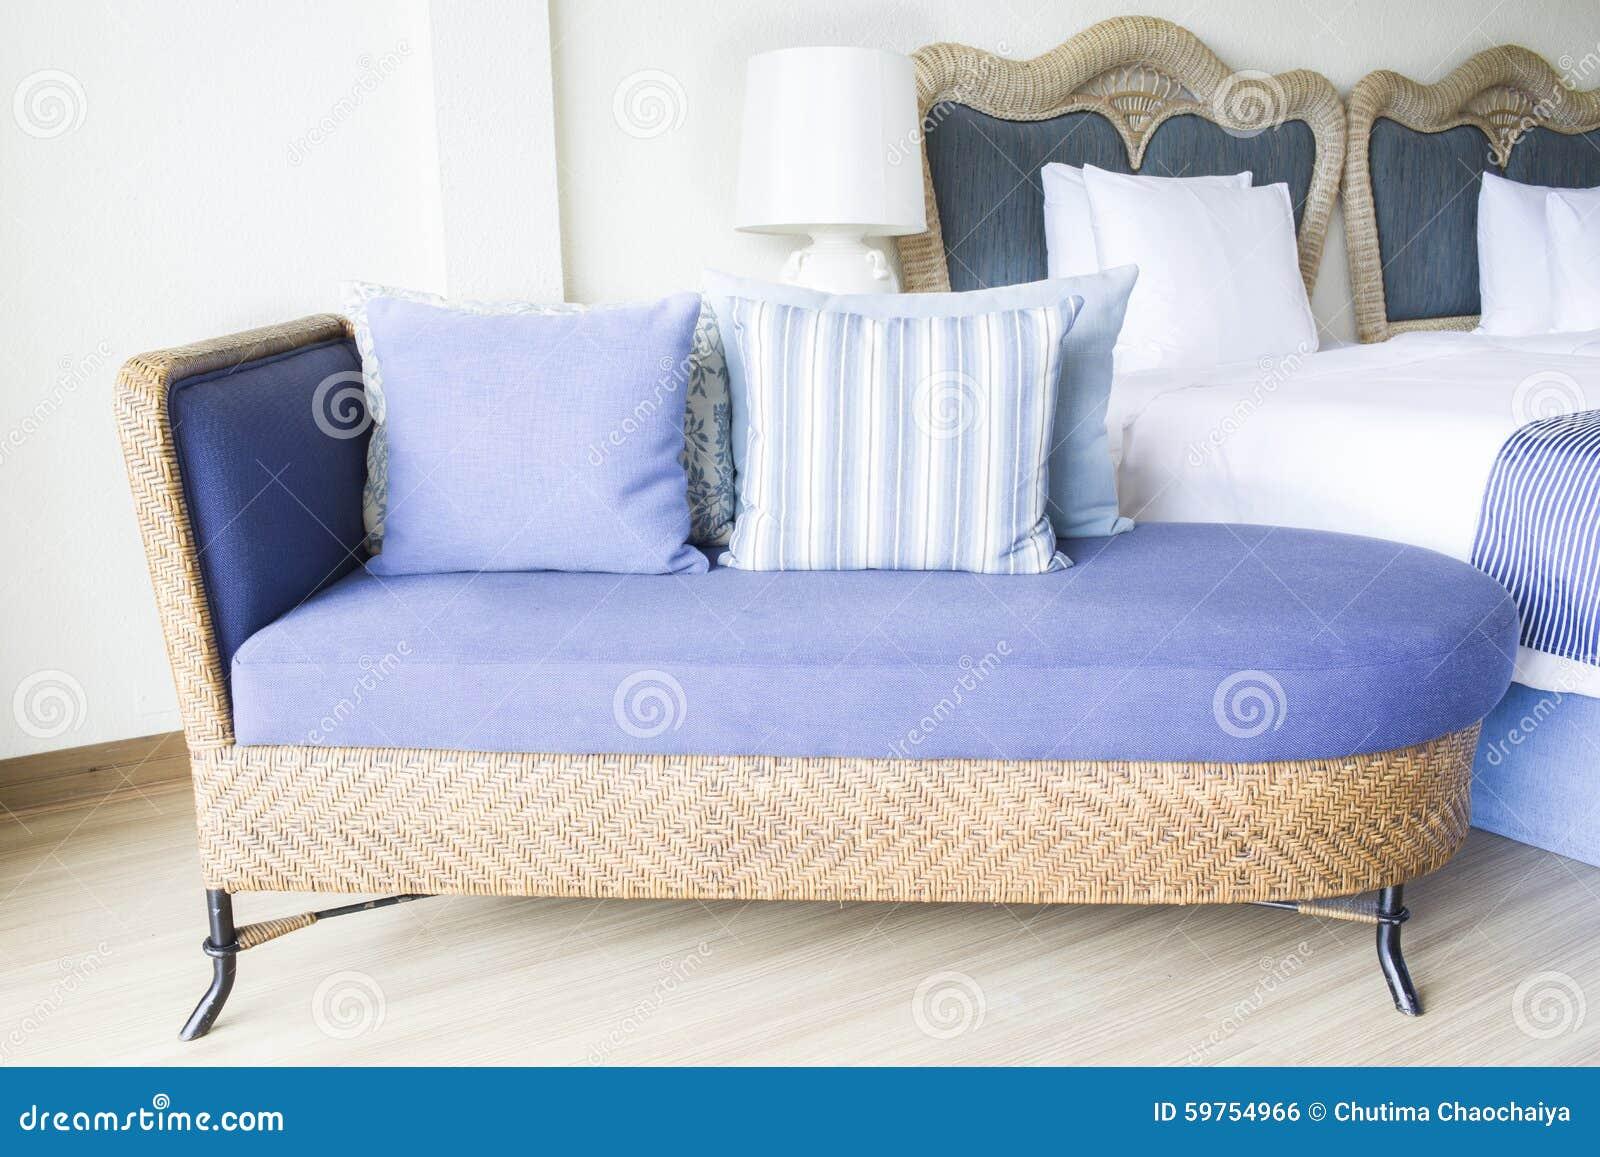 bankje bij bed latest houten bankje slaapkamer images